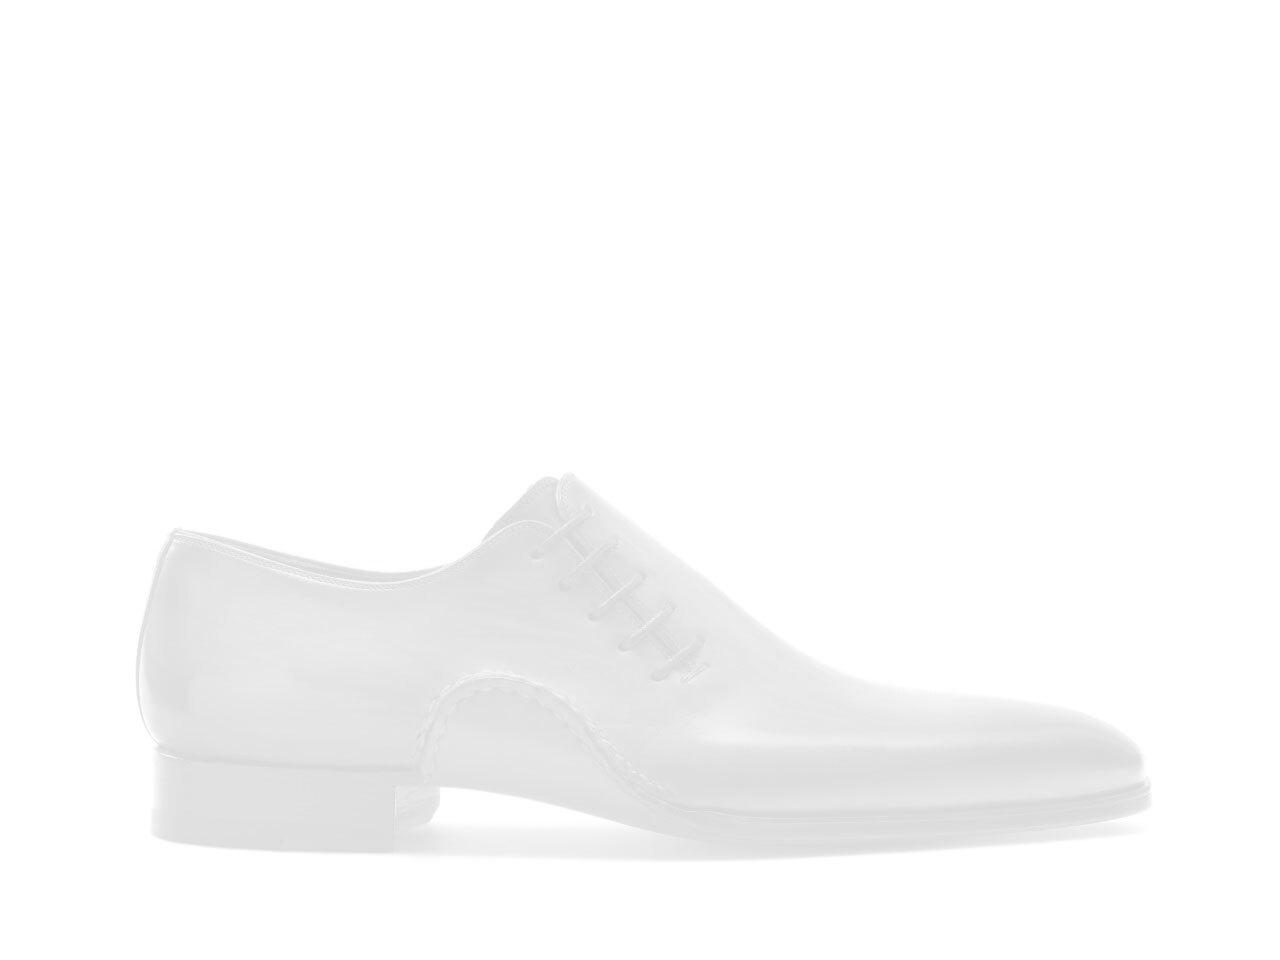 Pair of the Magnanni Cangas II Cognac Suede Men's Single Monk Strap Shoes